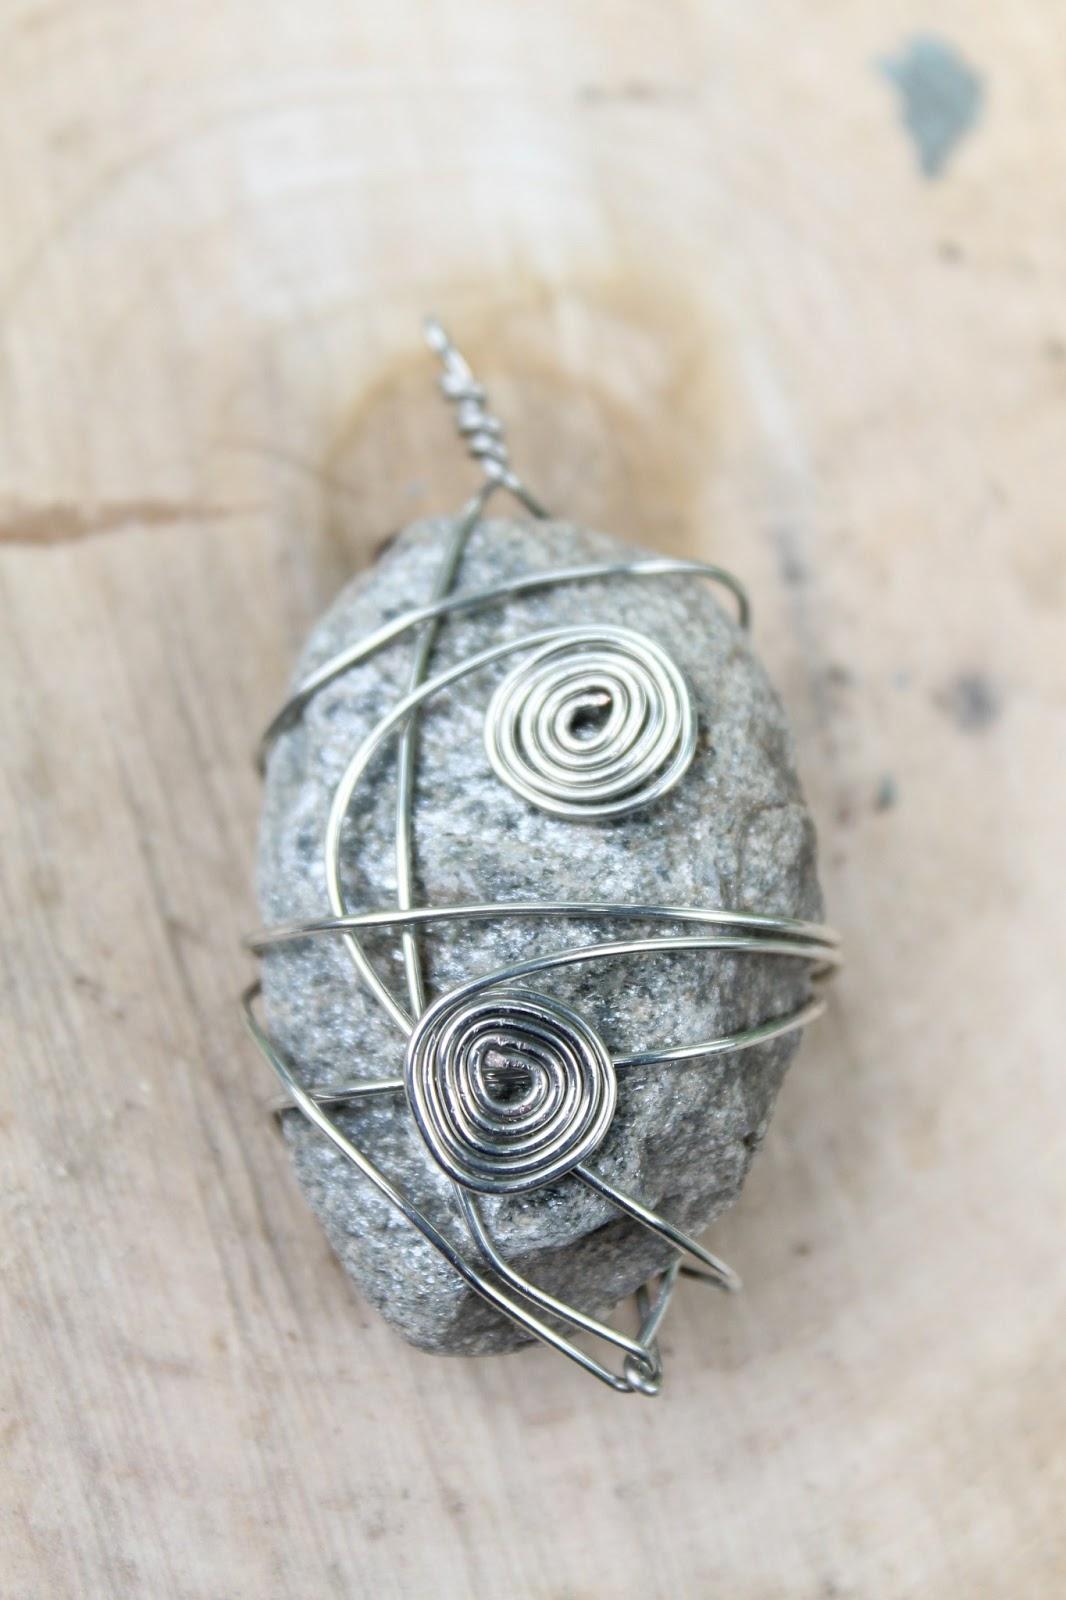 Diy Souvenirs Wire Wrapped Stone Pendants Do Small